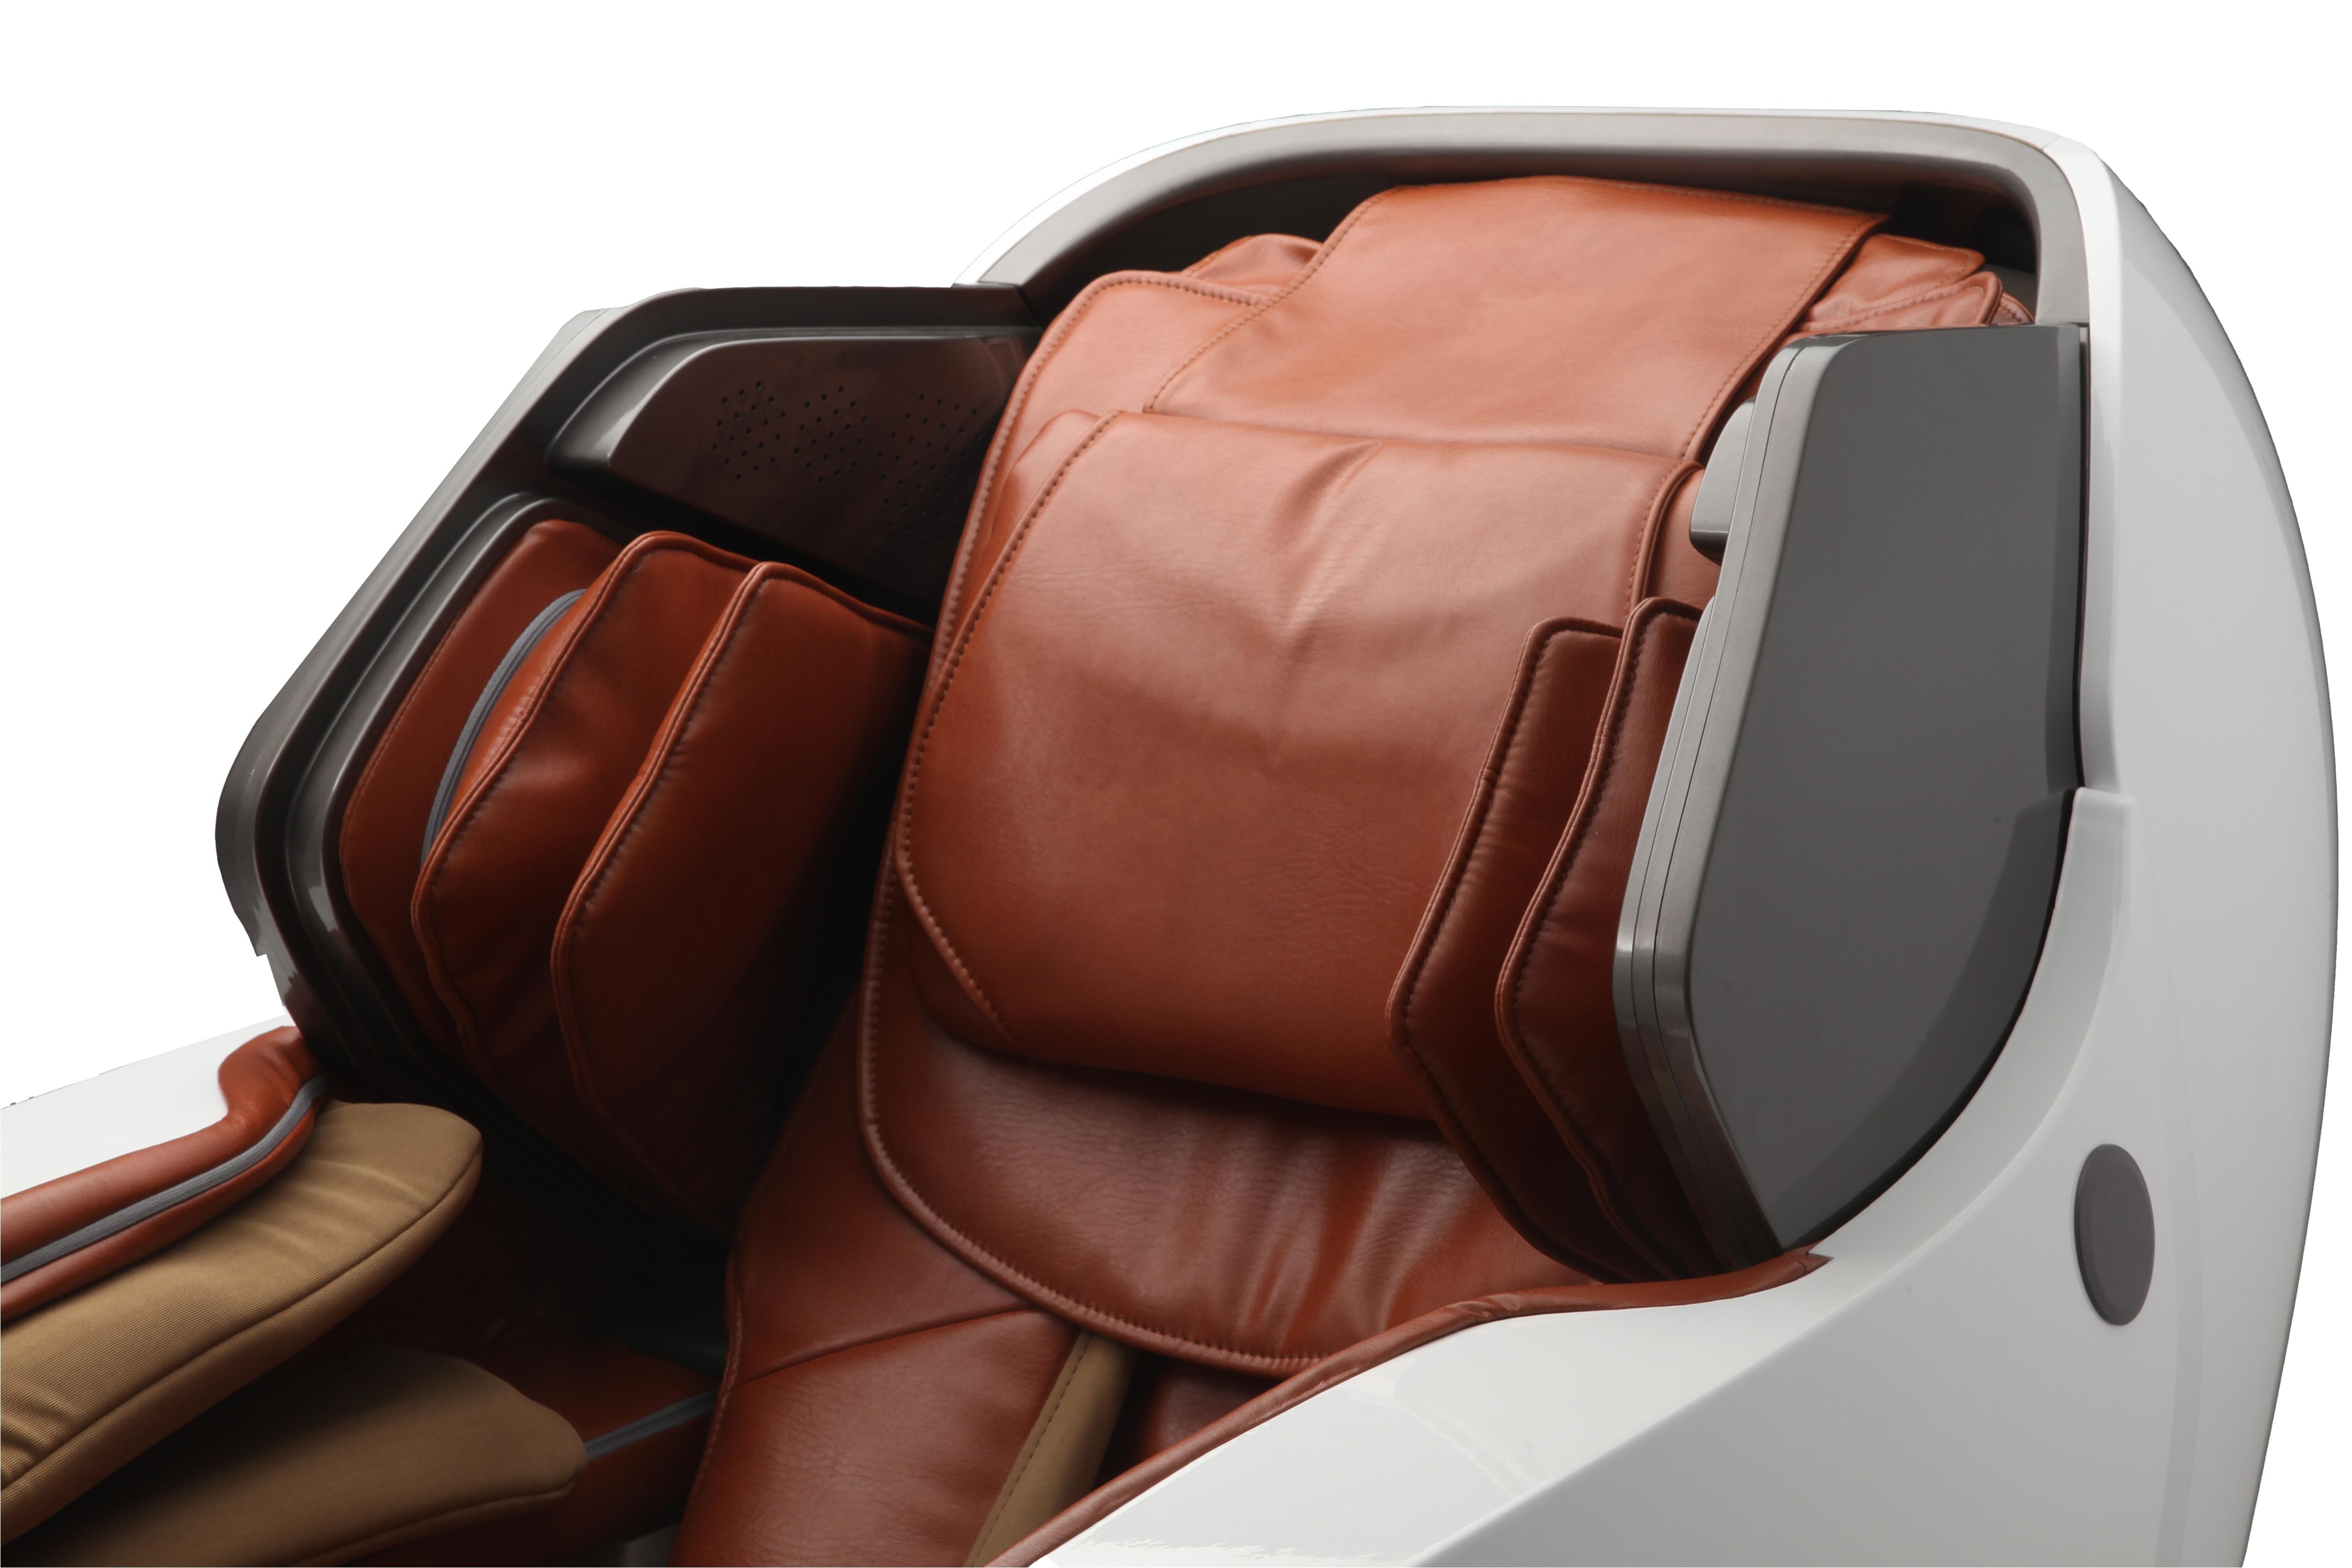 Infinity Iyashi Zero-gravity Massage Chair Leather Infinite Infinity Iyashi Images